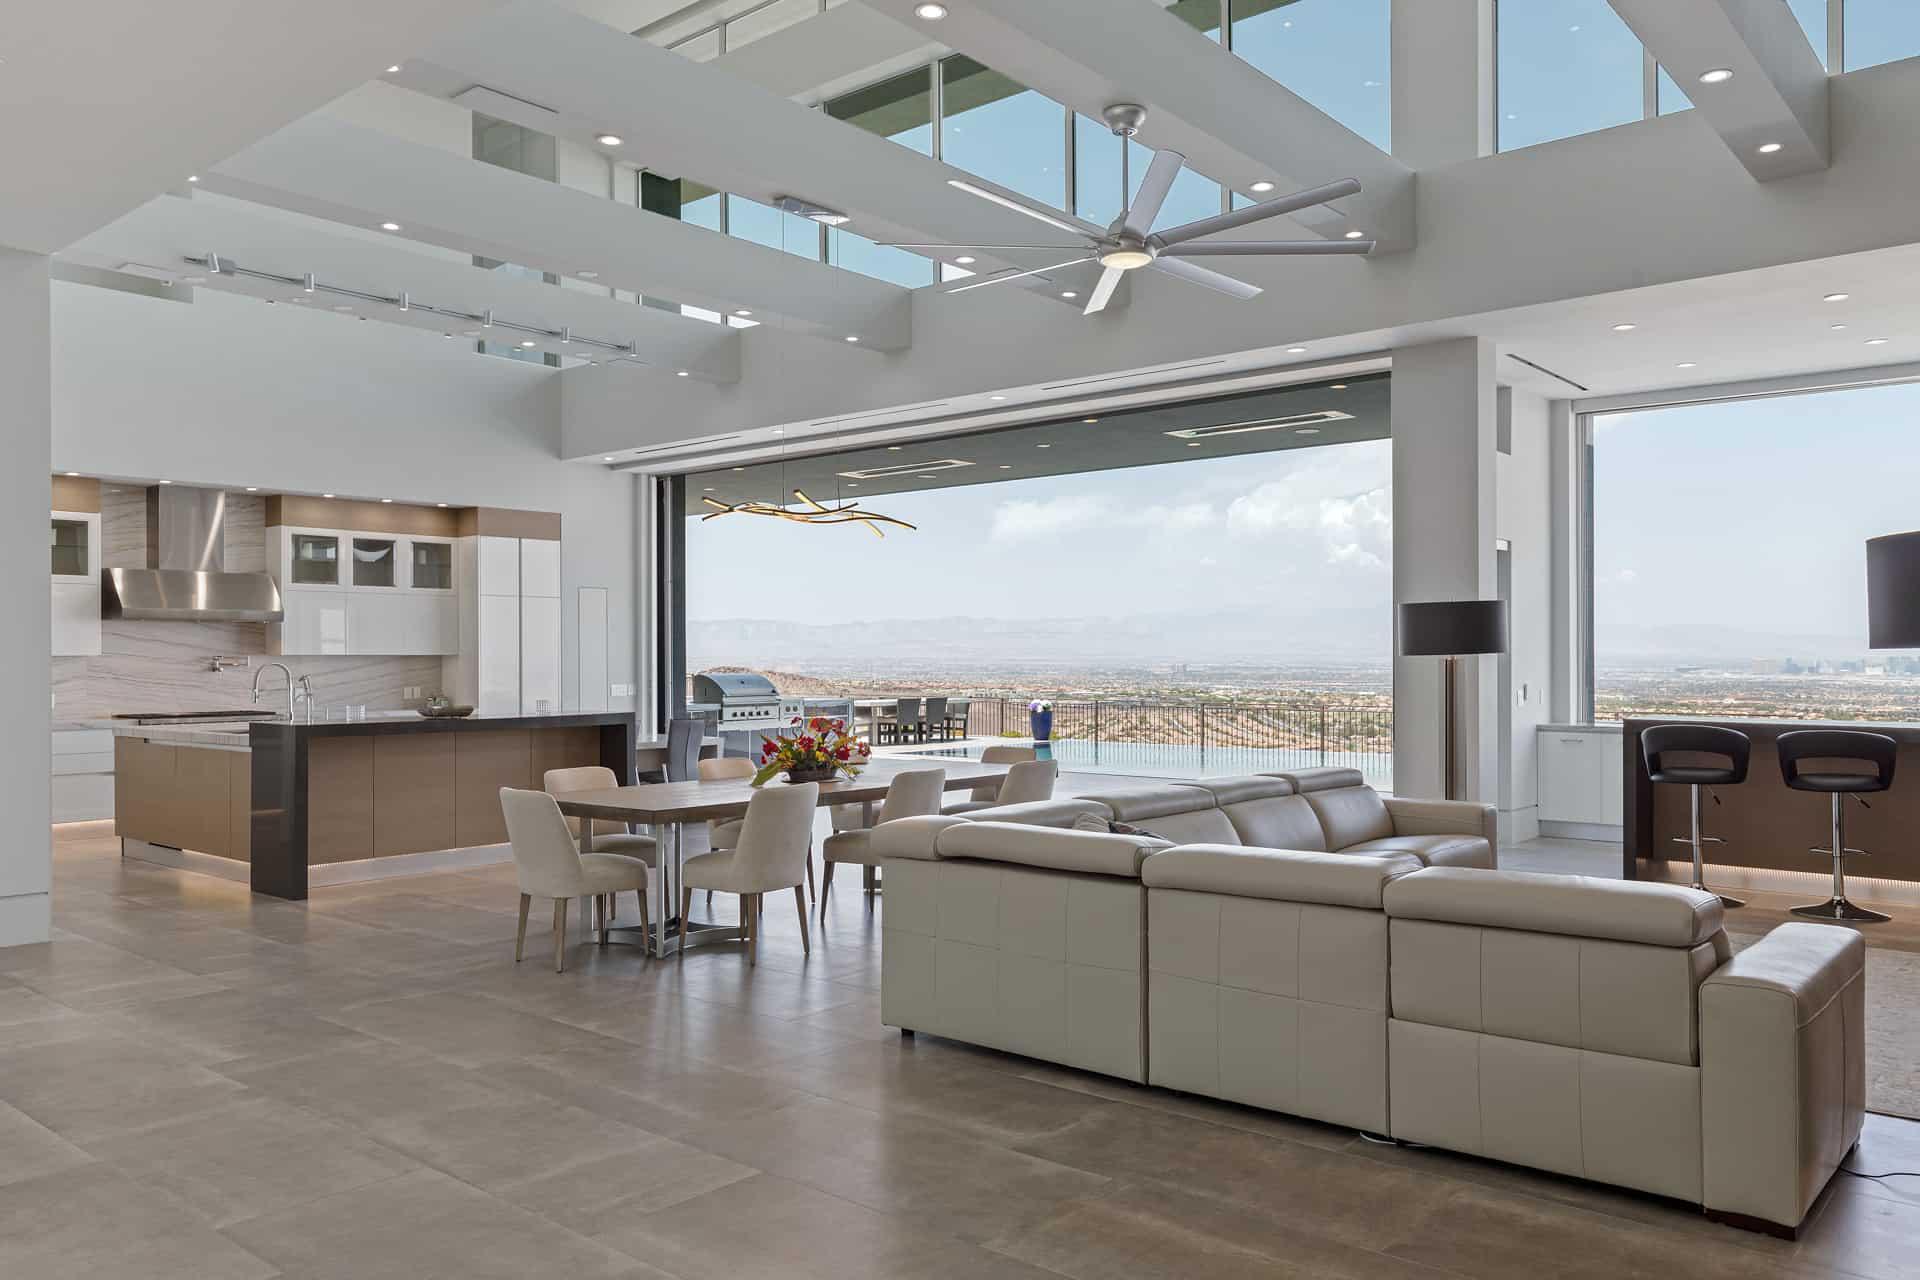 las-vegas-luxry-real-estate-realtor-rob-jensen-company-5-rockstream-drive-ascaya019